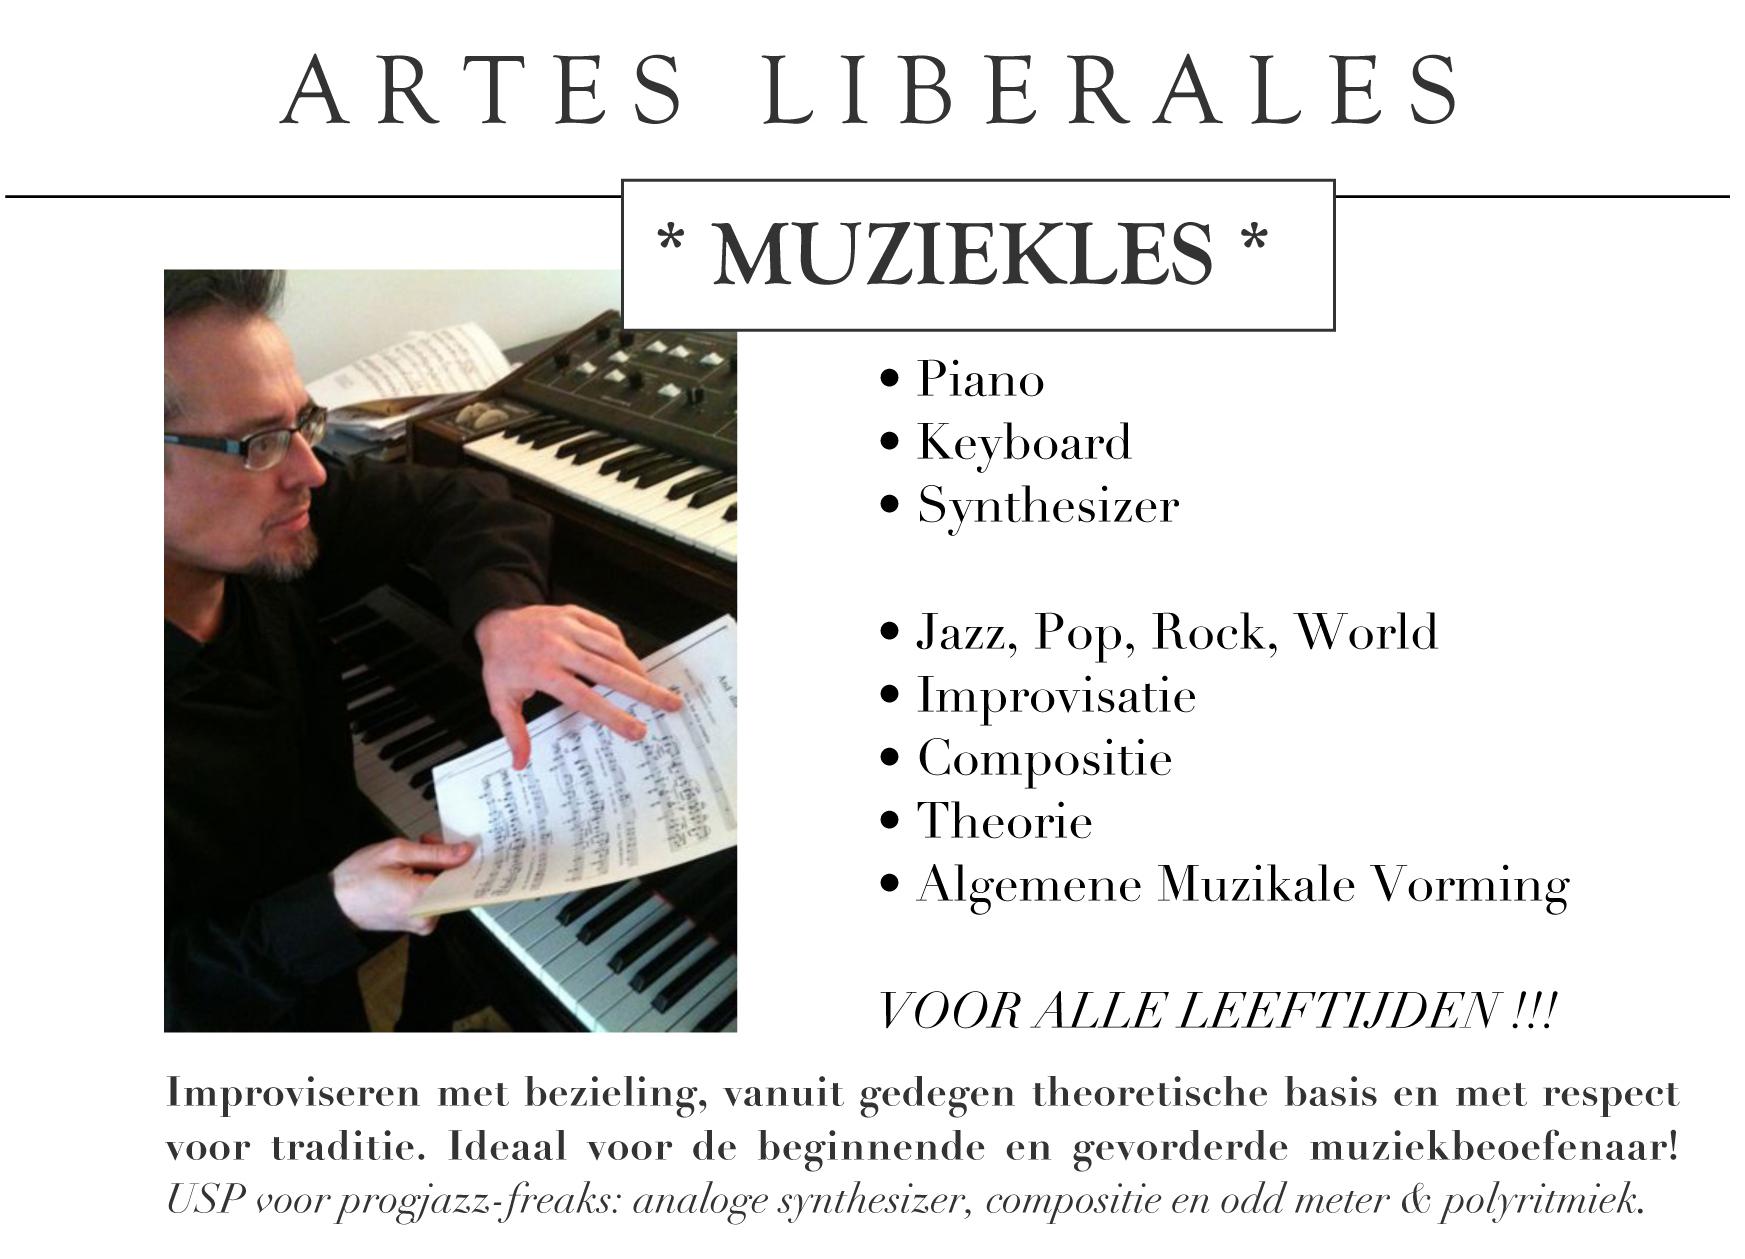 ARTES LIBERALES muziekles